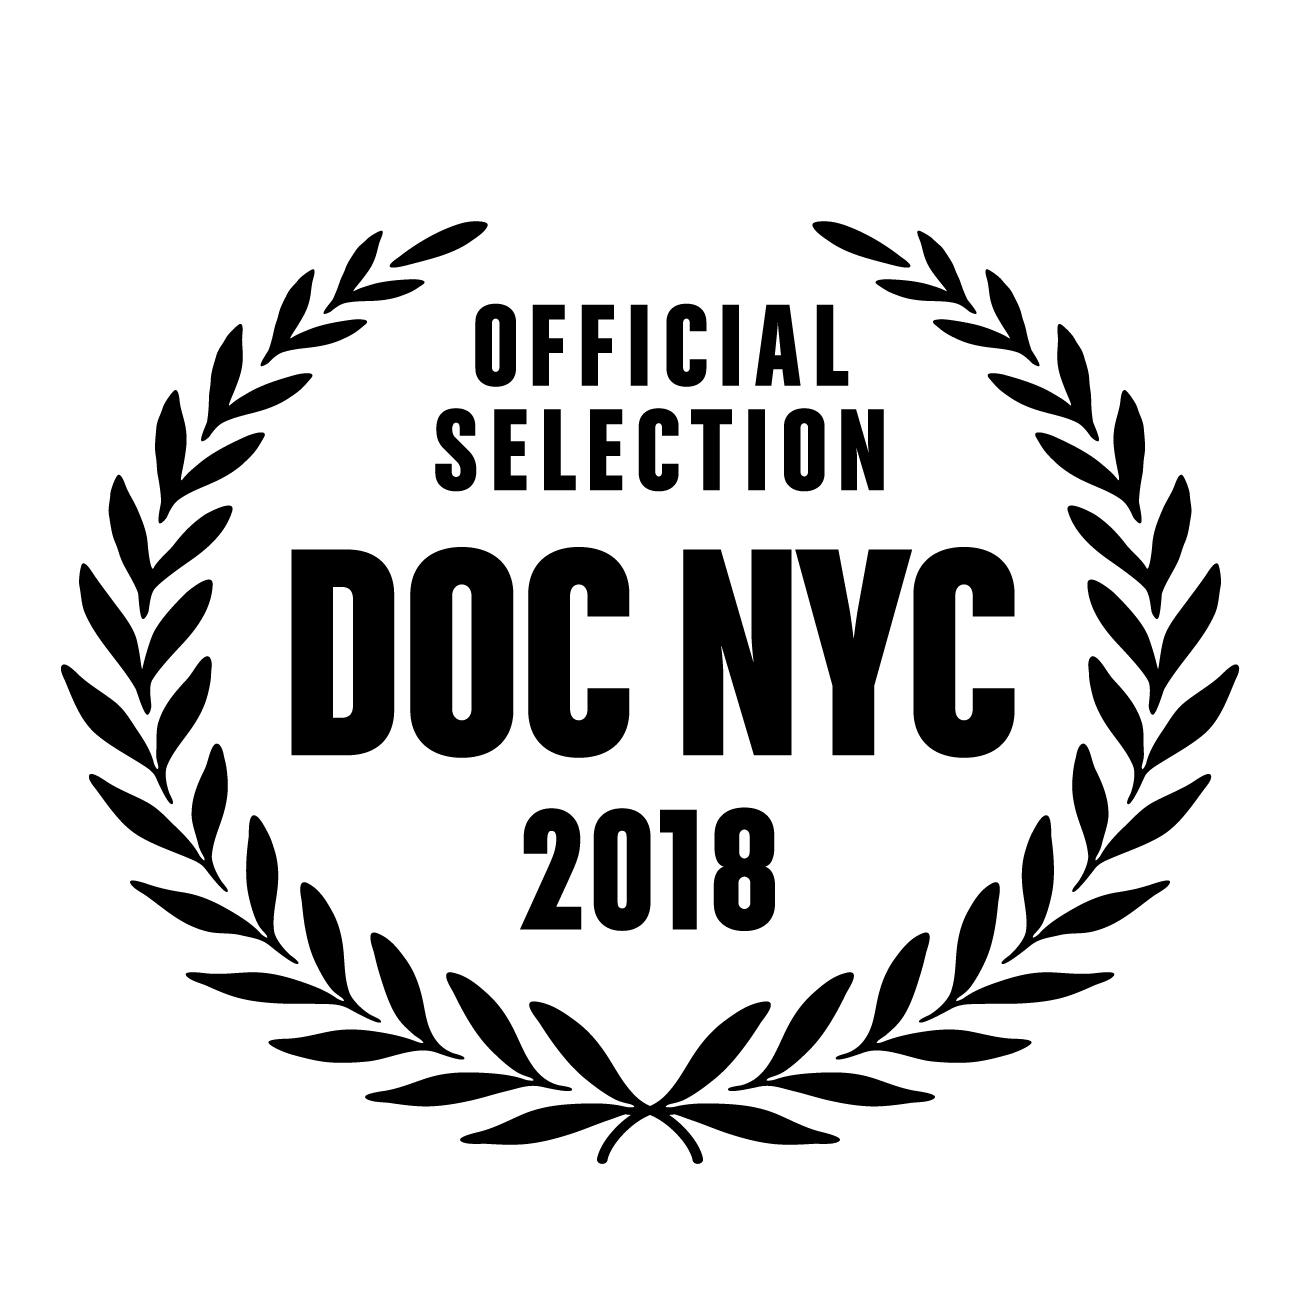 DOCNYC18Laurels_KO-officialselection (1) copy.jpg